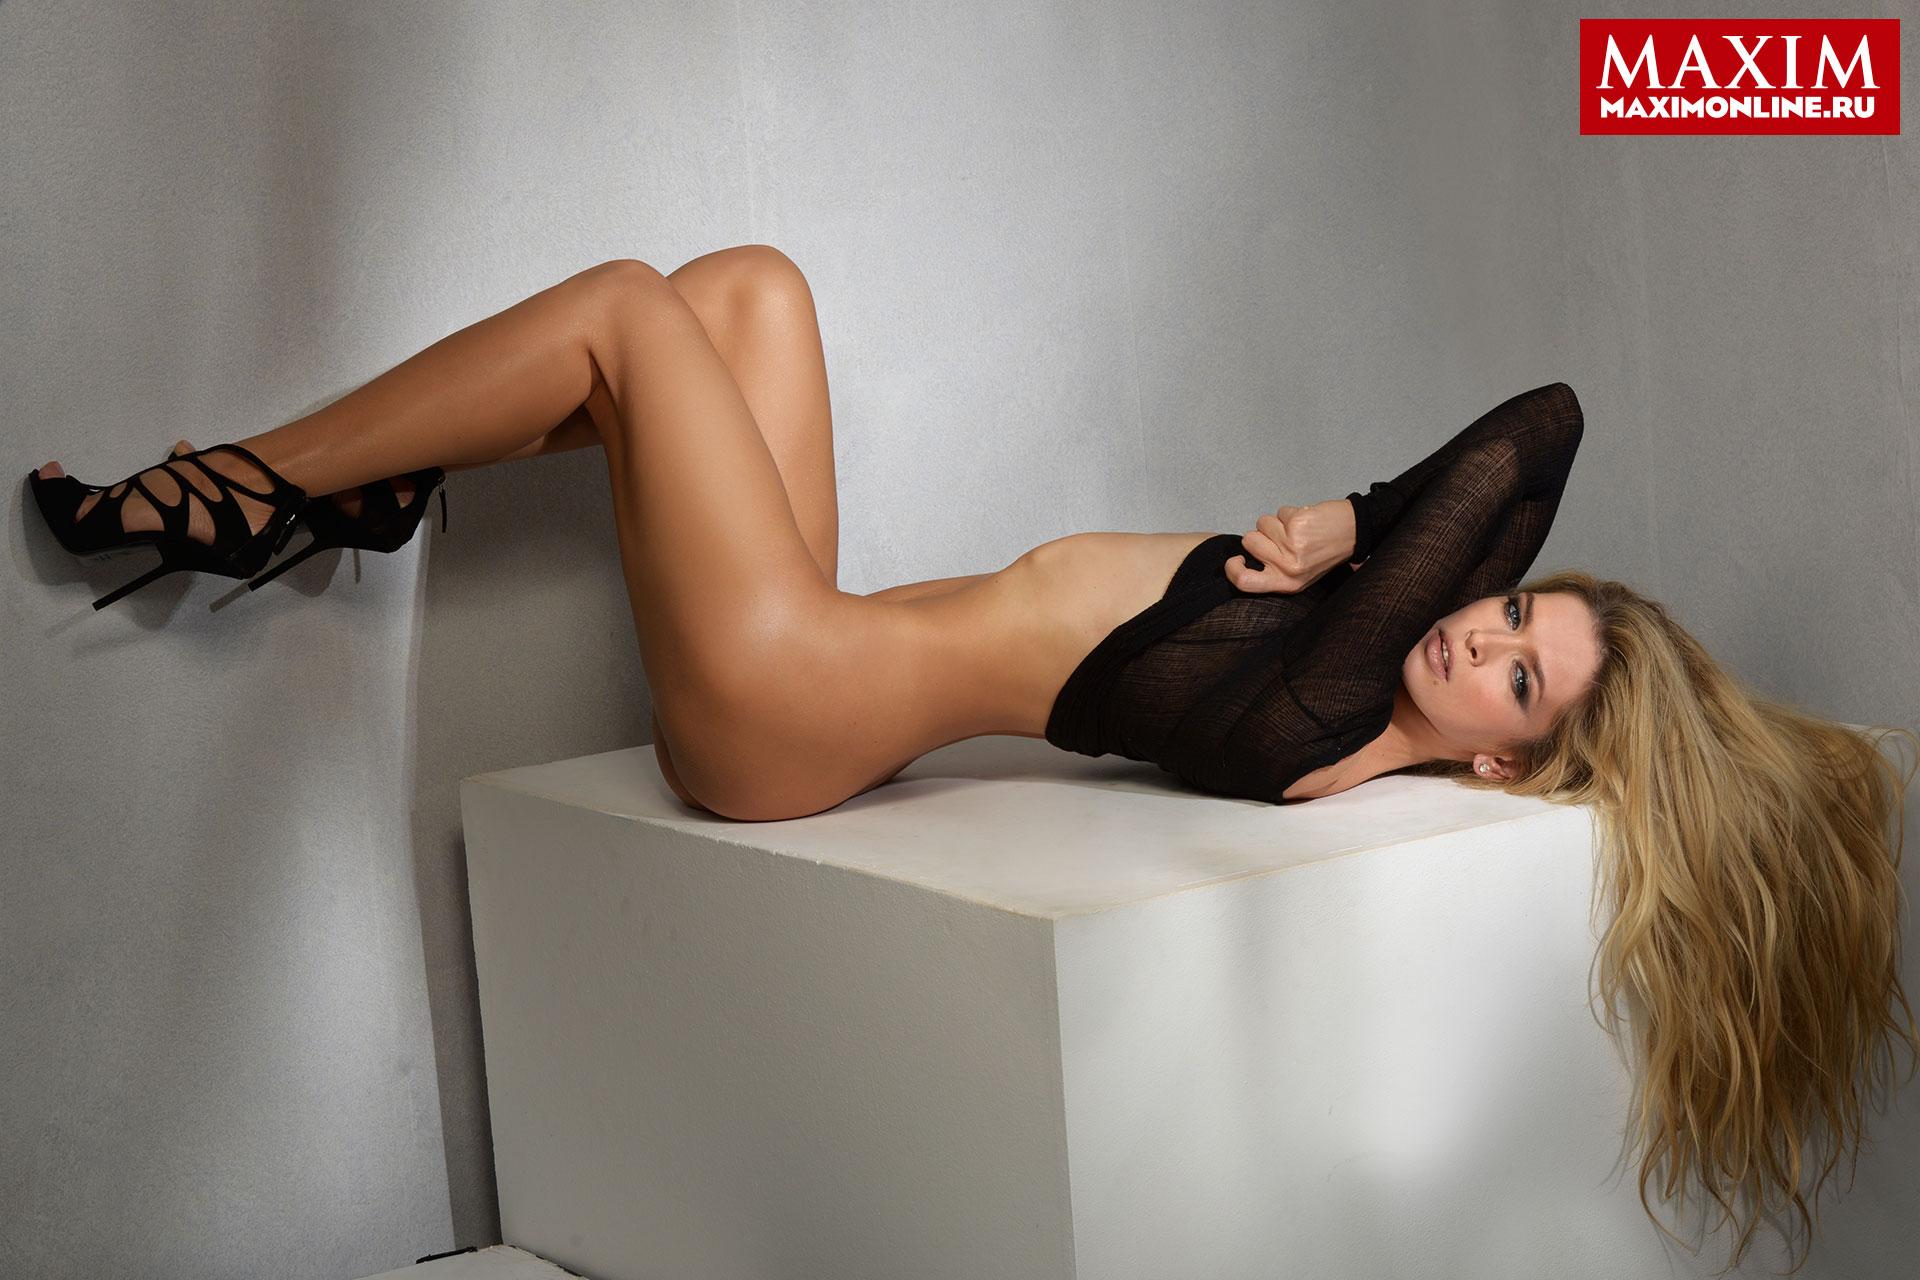 Секс певица брежнева 14 фотография